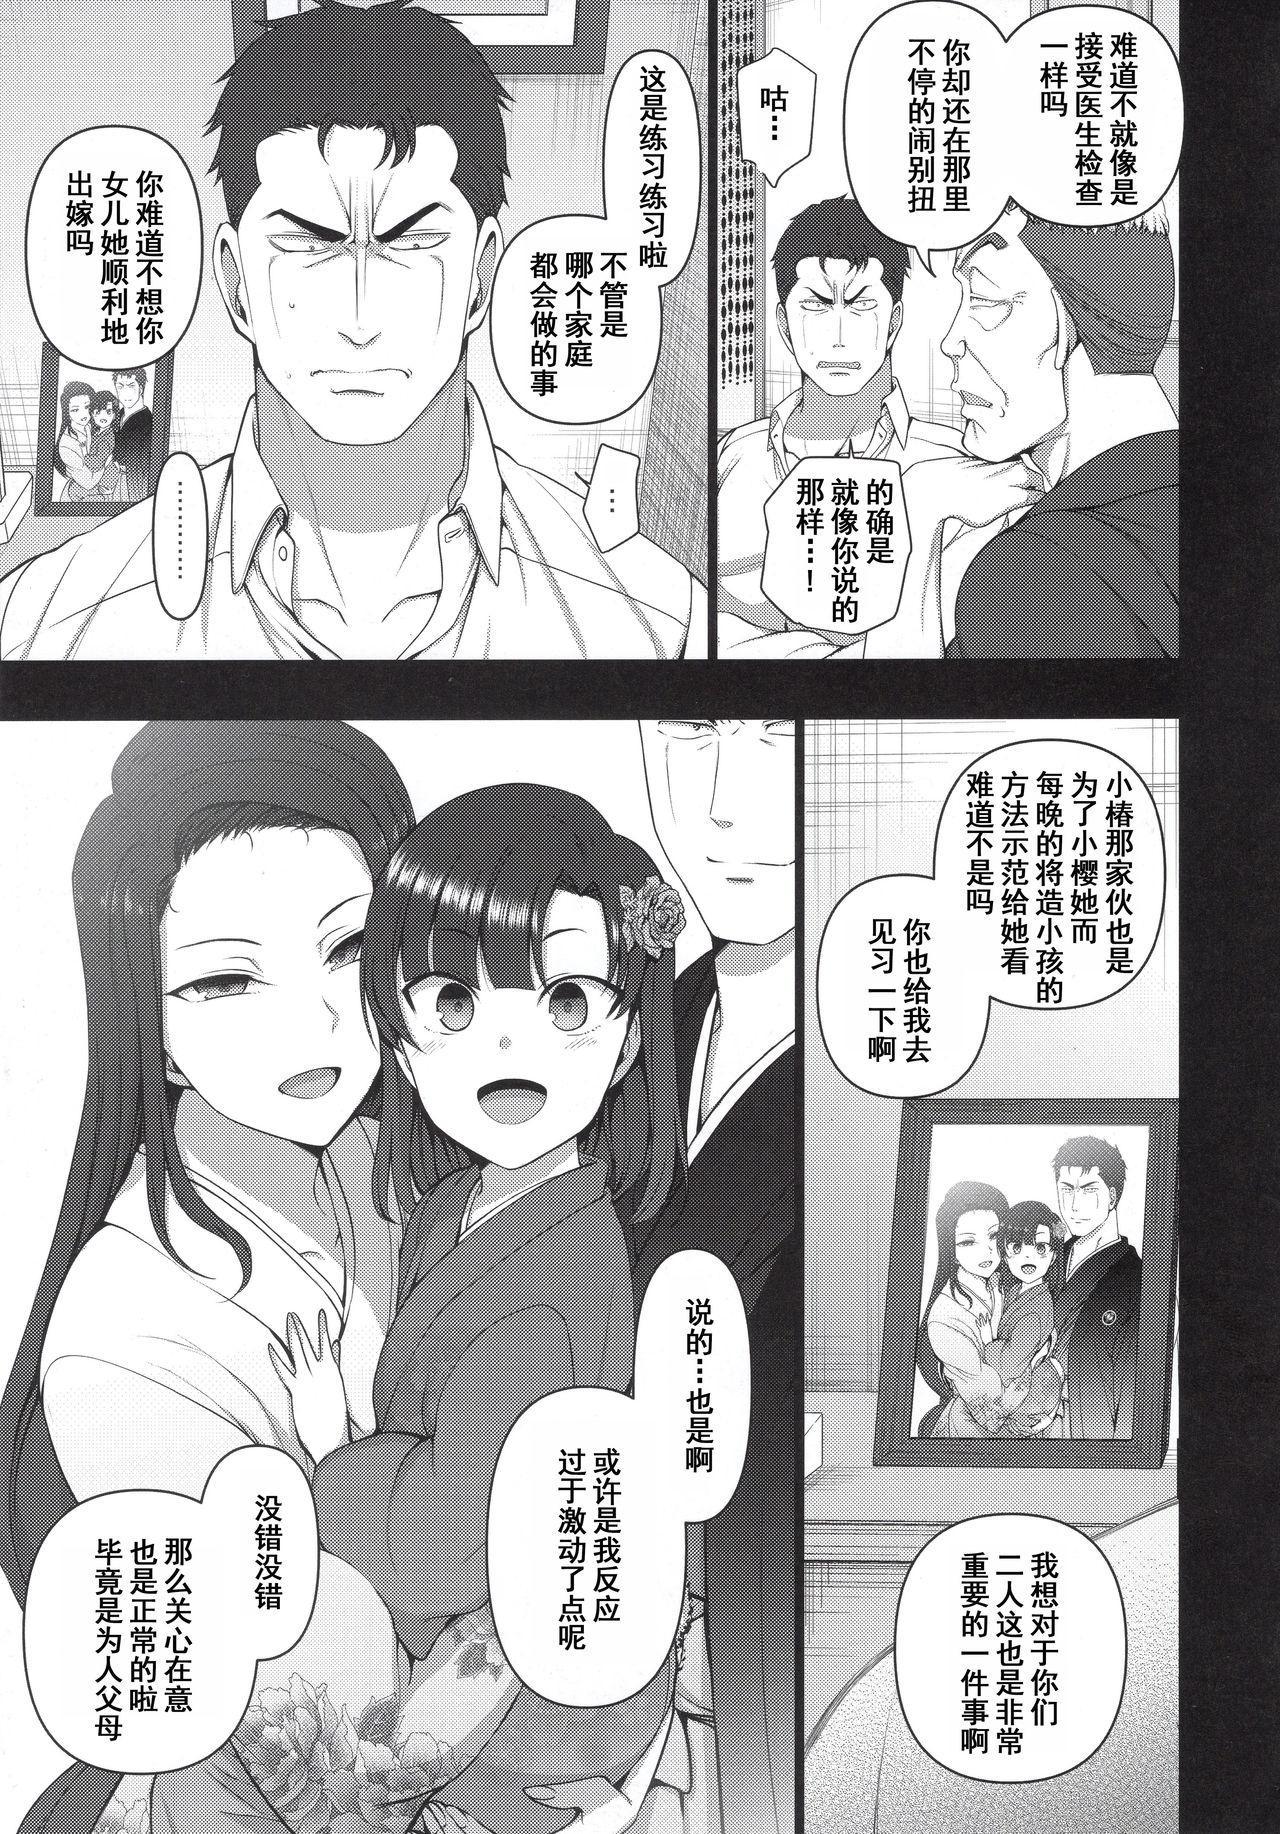 Saimin Seishidou 4: Ninshin Taiken Shidou 34